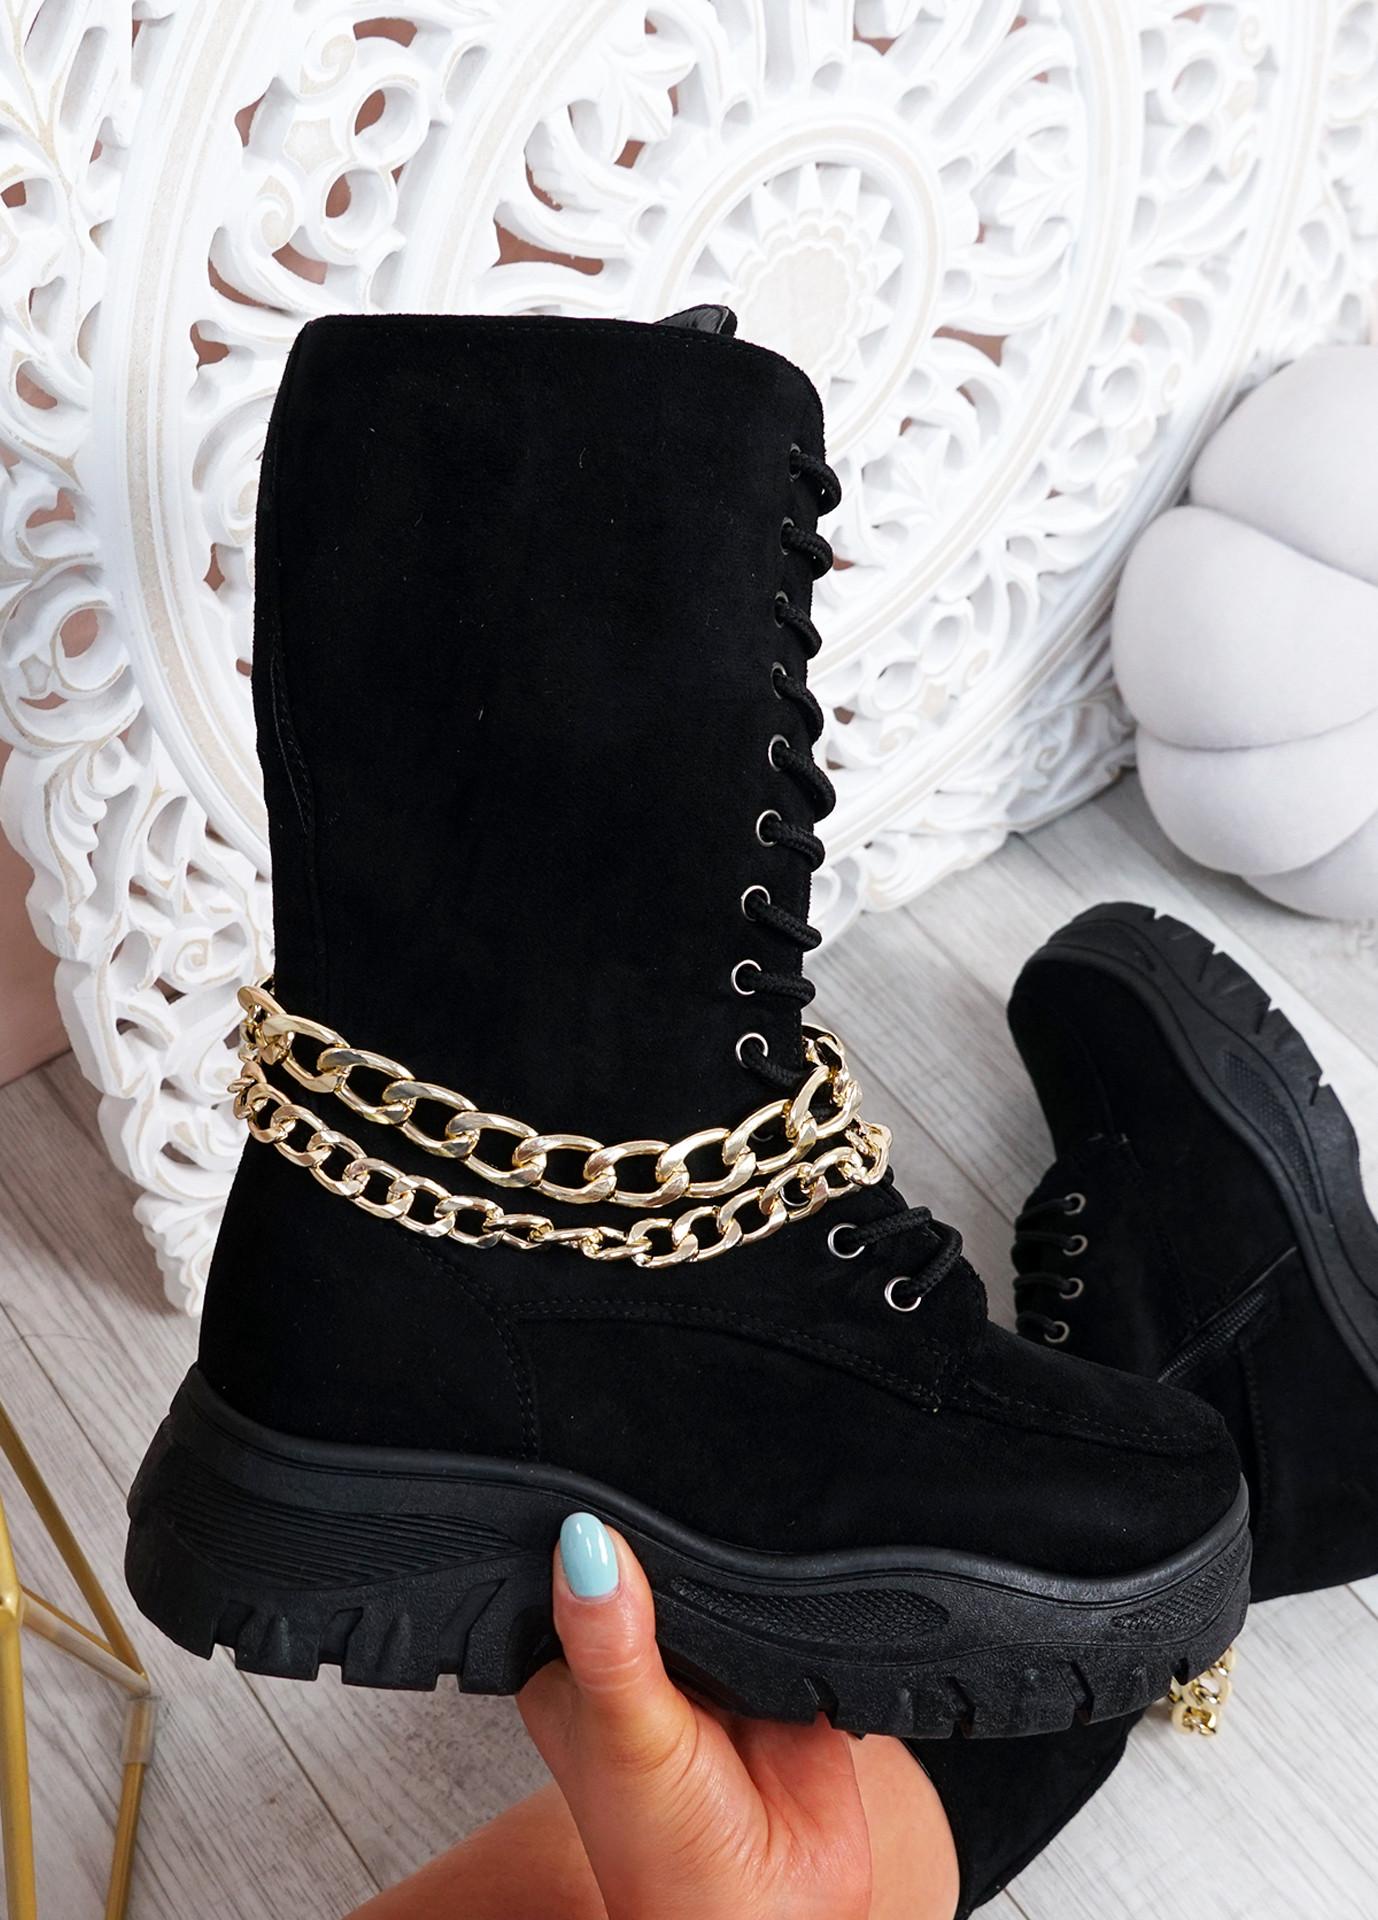 Paola Black Mid Calf Chain Boots